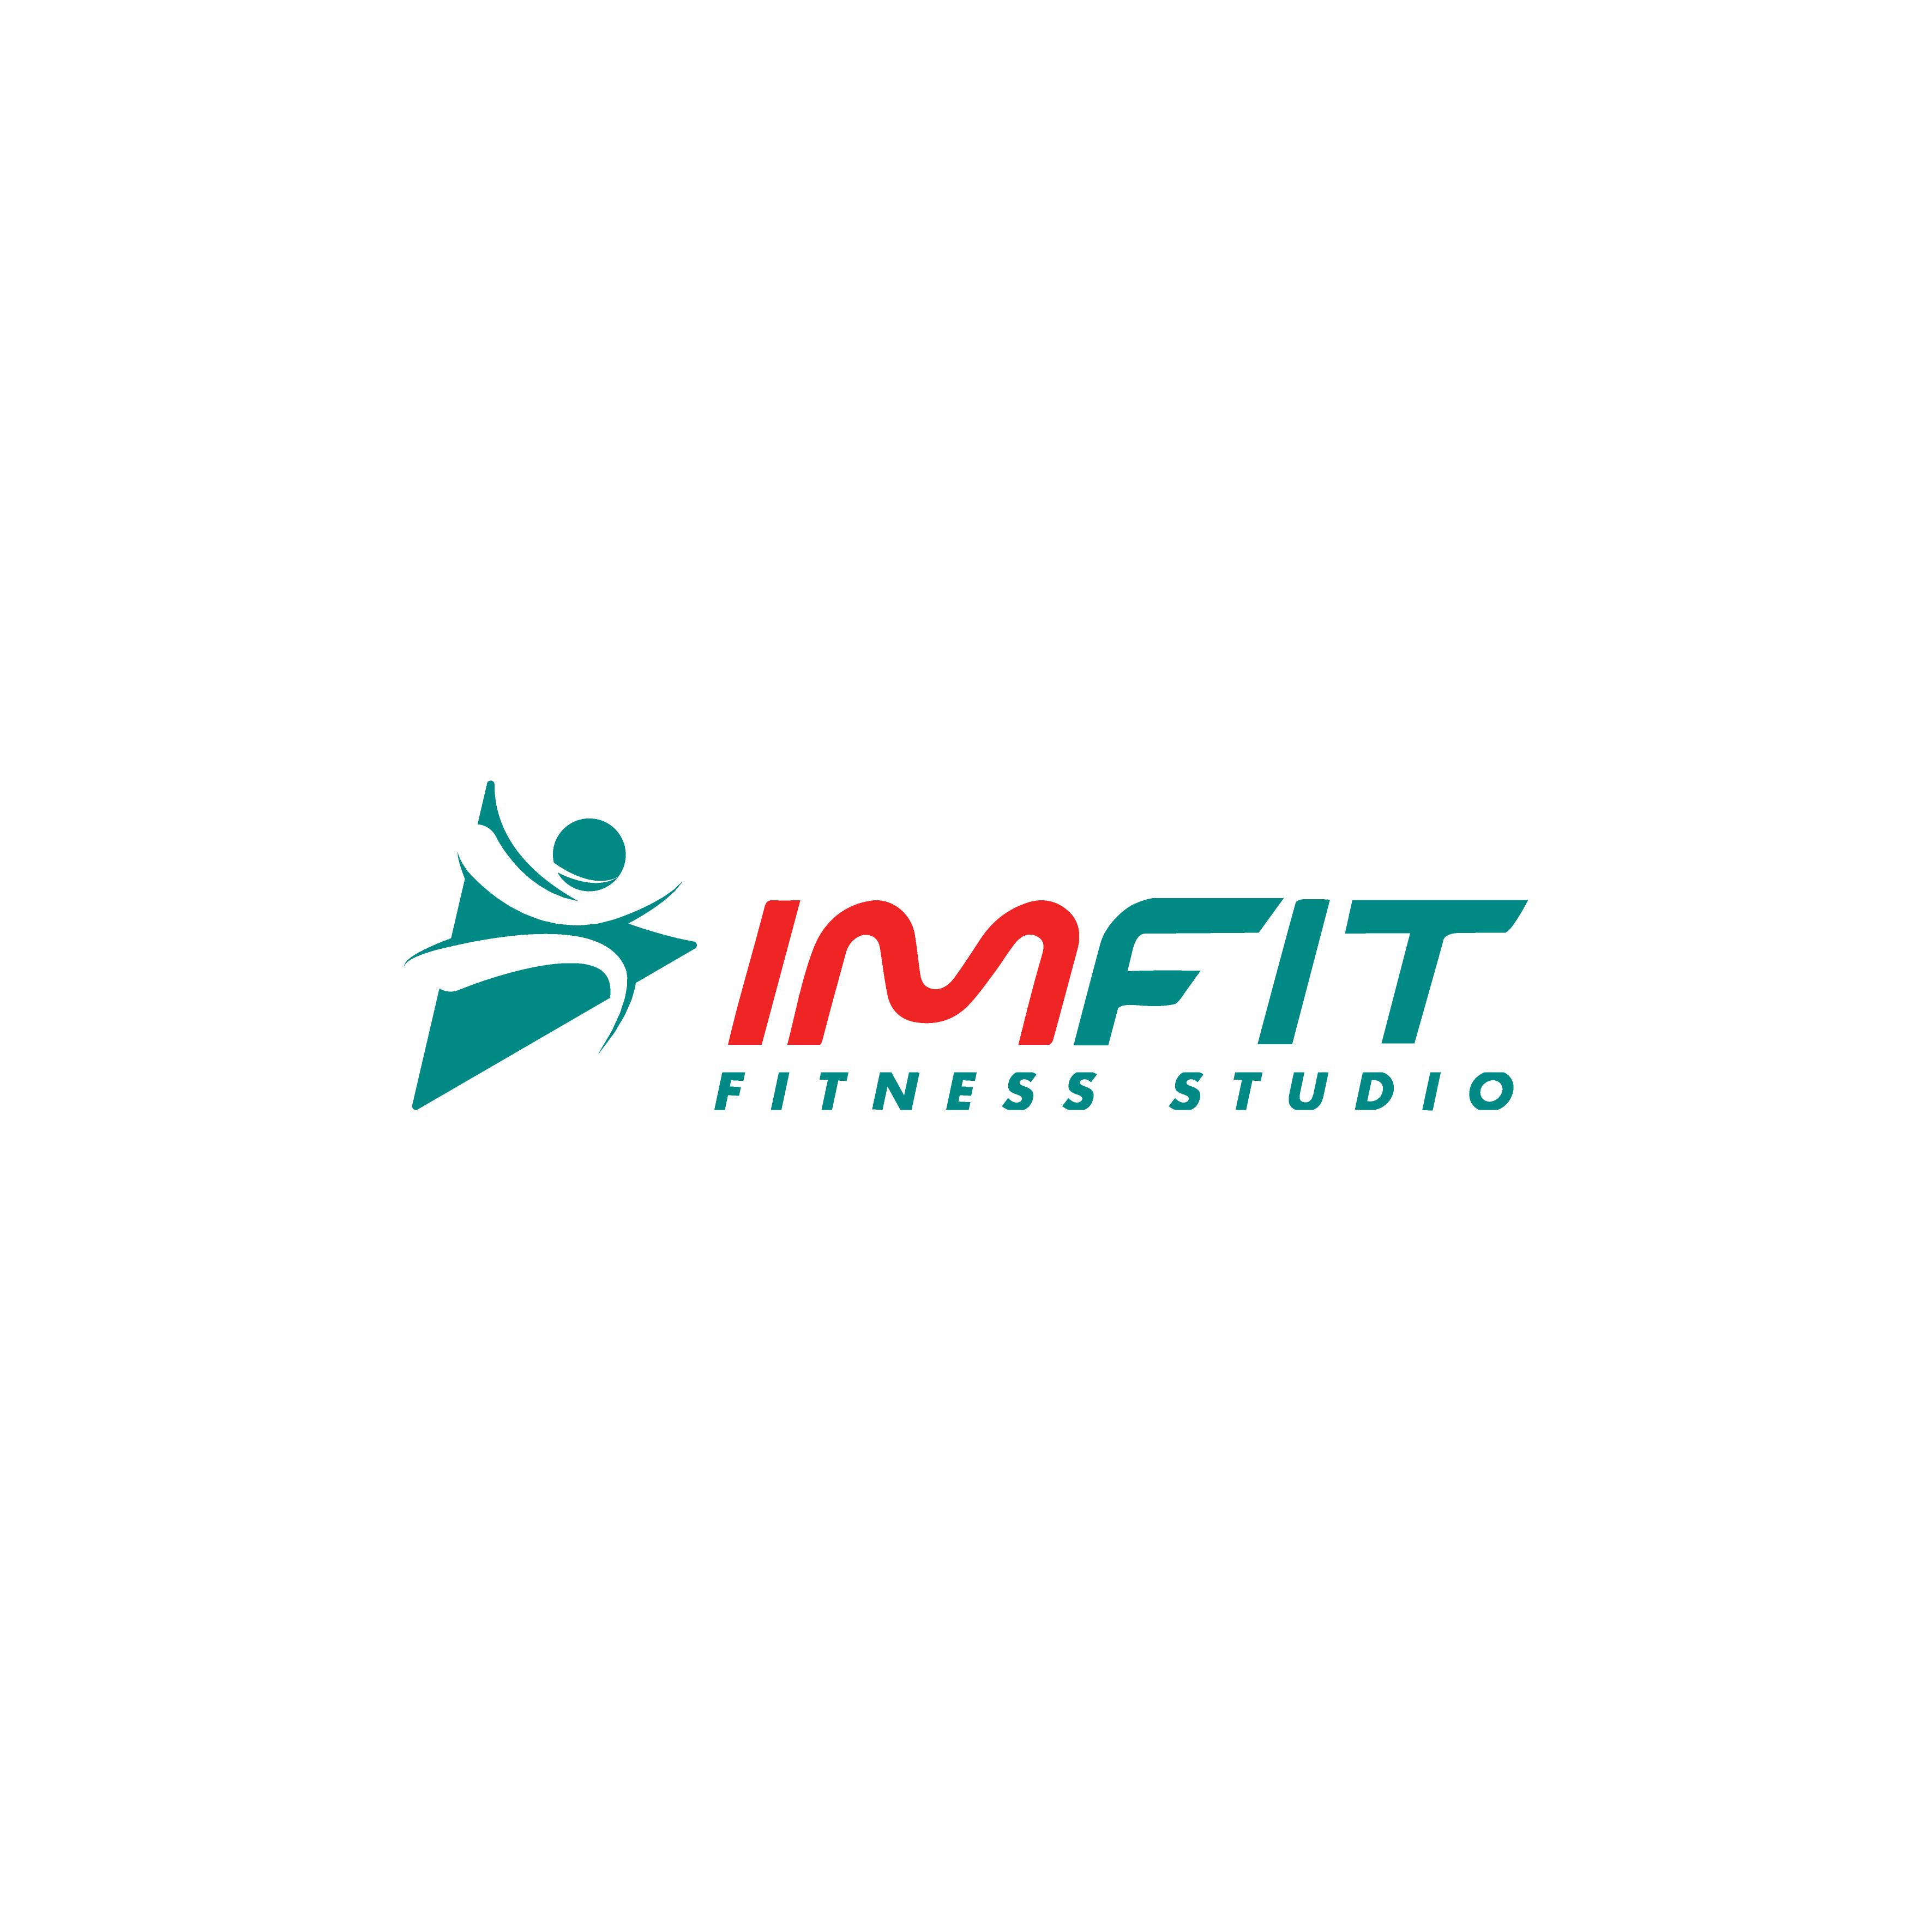 IMFIT Fitness Studio